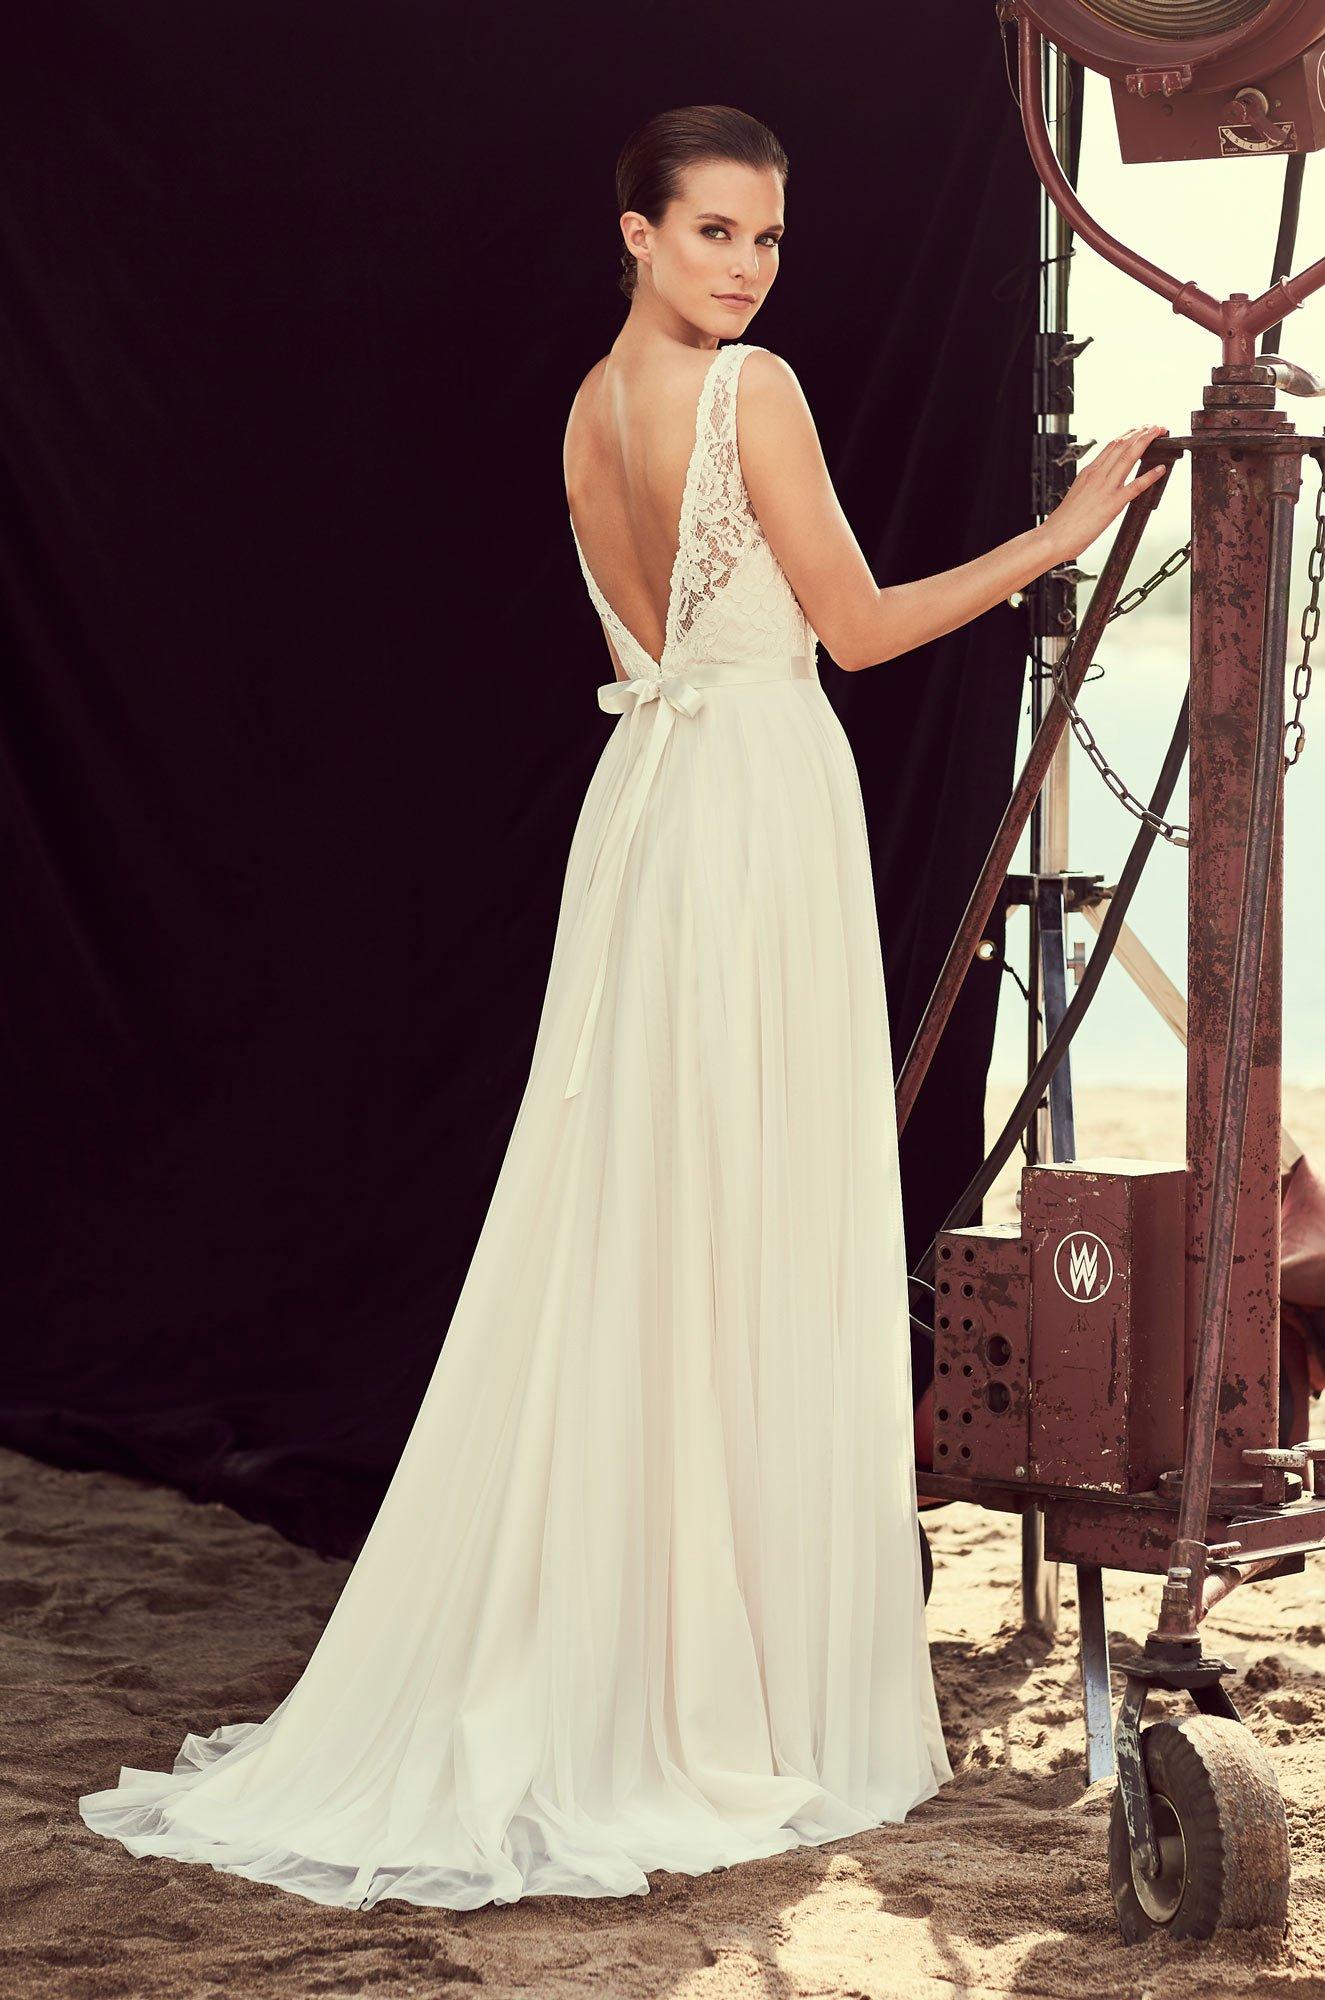 Scalloped Plunging Lace Wedding Dress – Style #2193 | Mikaella Bridal